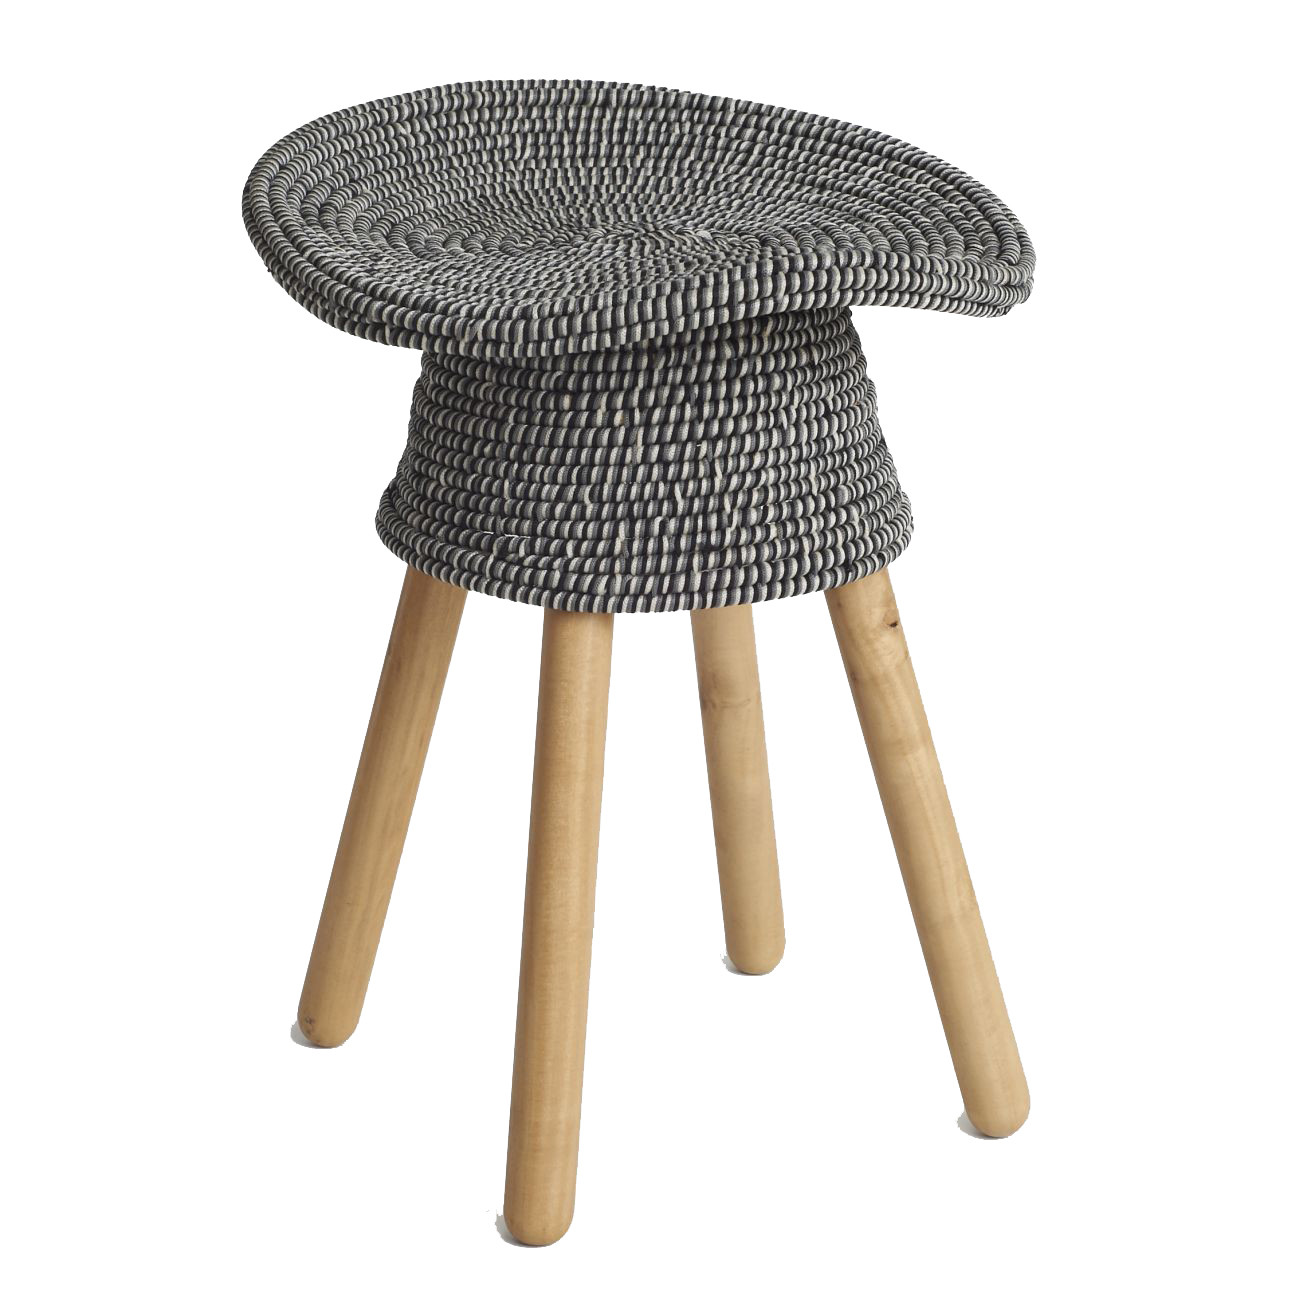 Umbra Coiled Sitzhocker